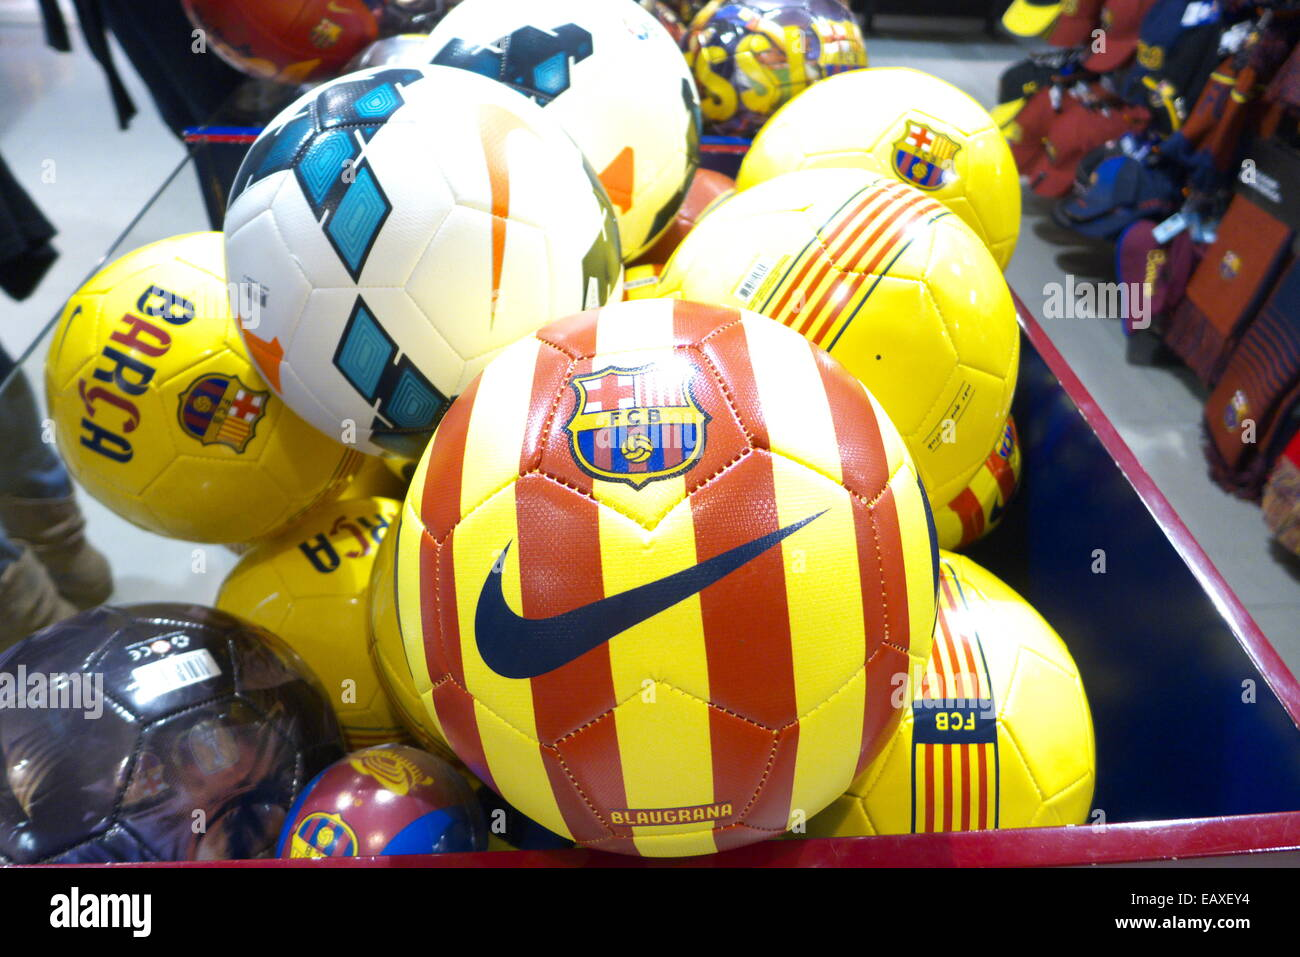 Spain Catalonia Barcelona FC Barcelona Fan club souvenirs shop - Stock Image